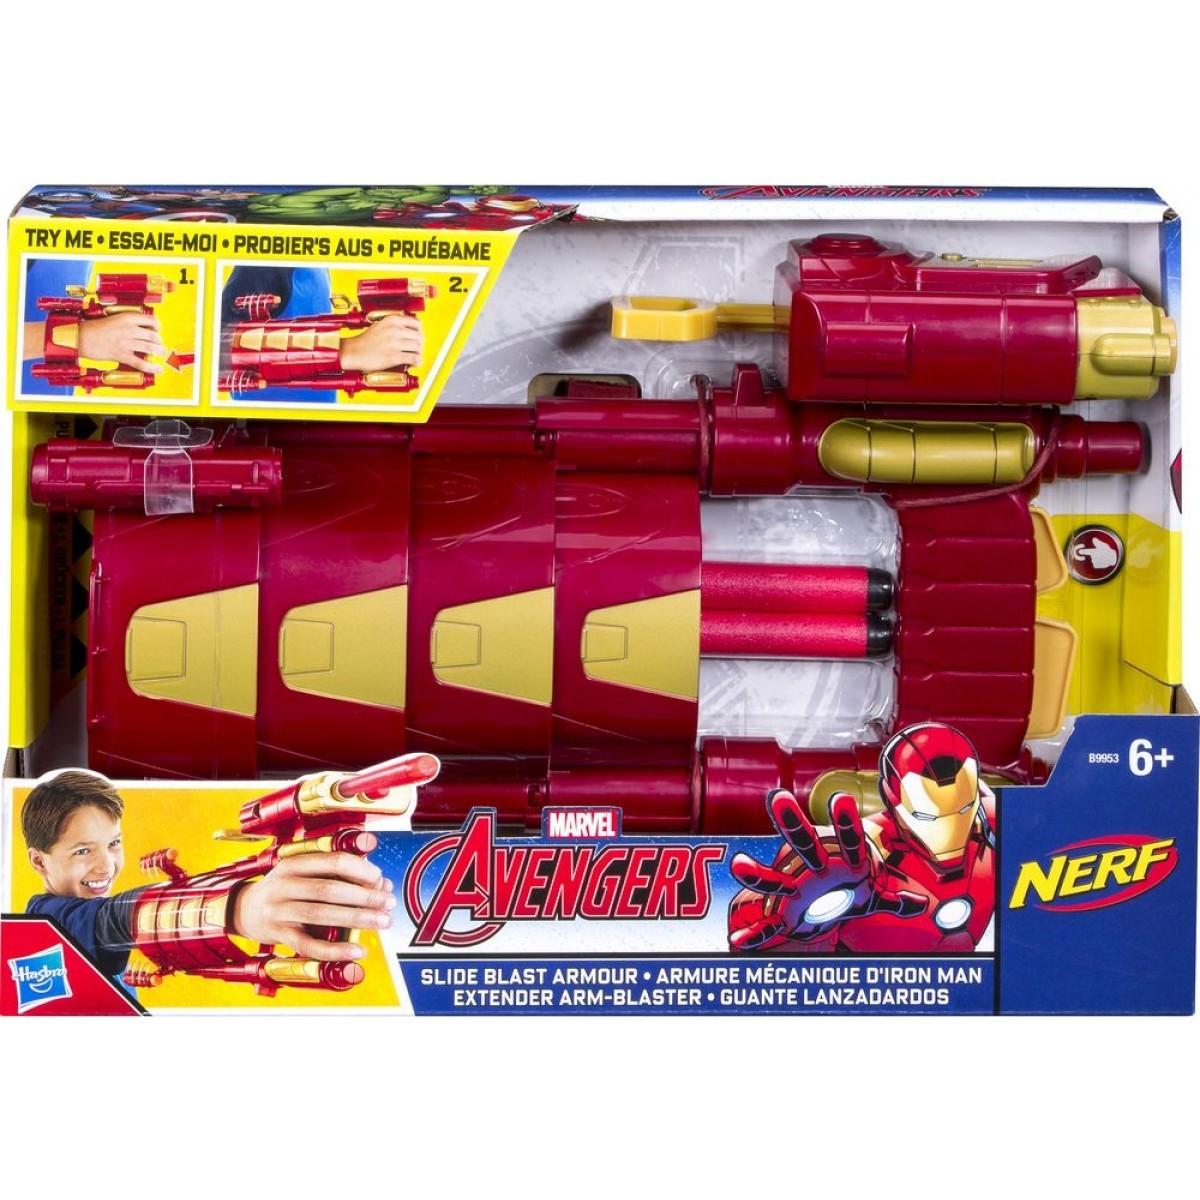 Nerf: Marvel Iron Man Side Blast Armour image